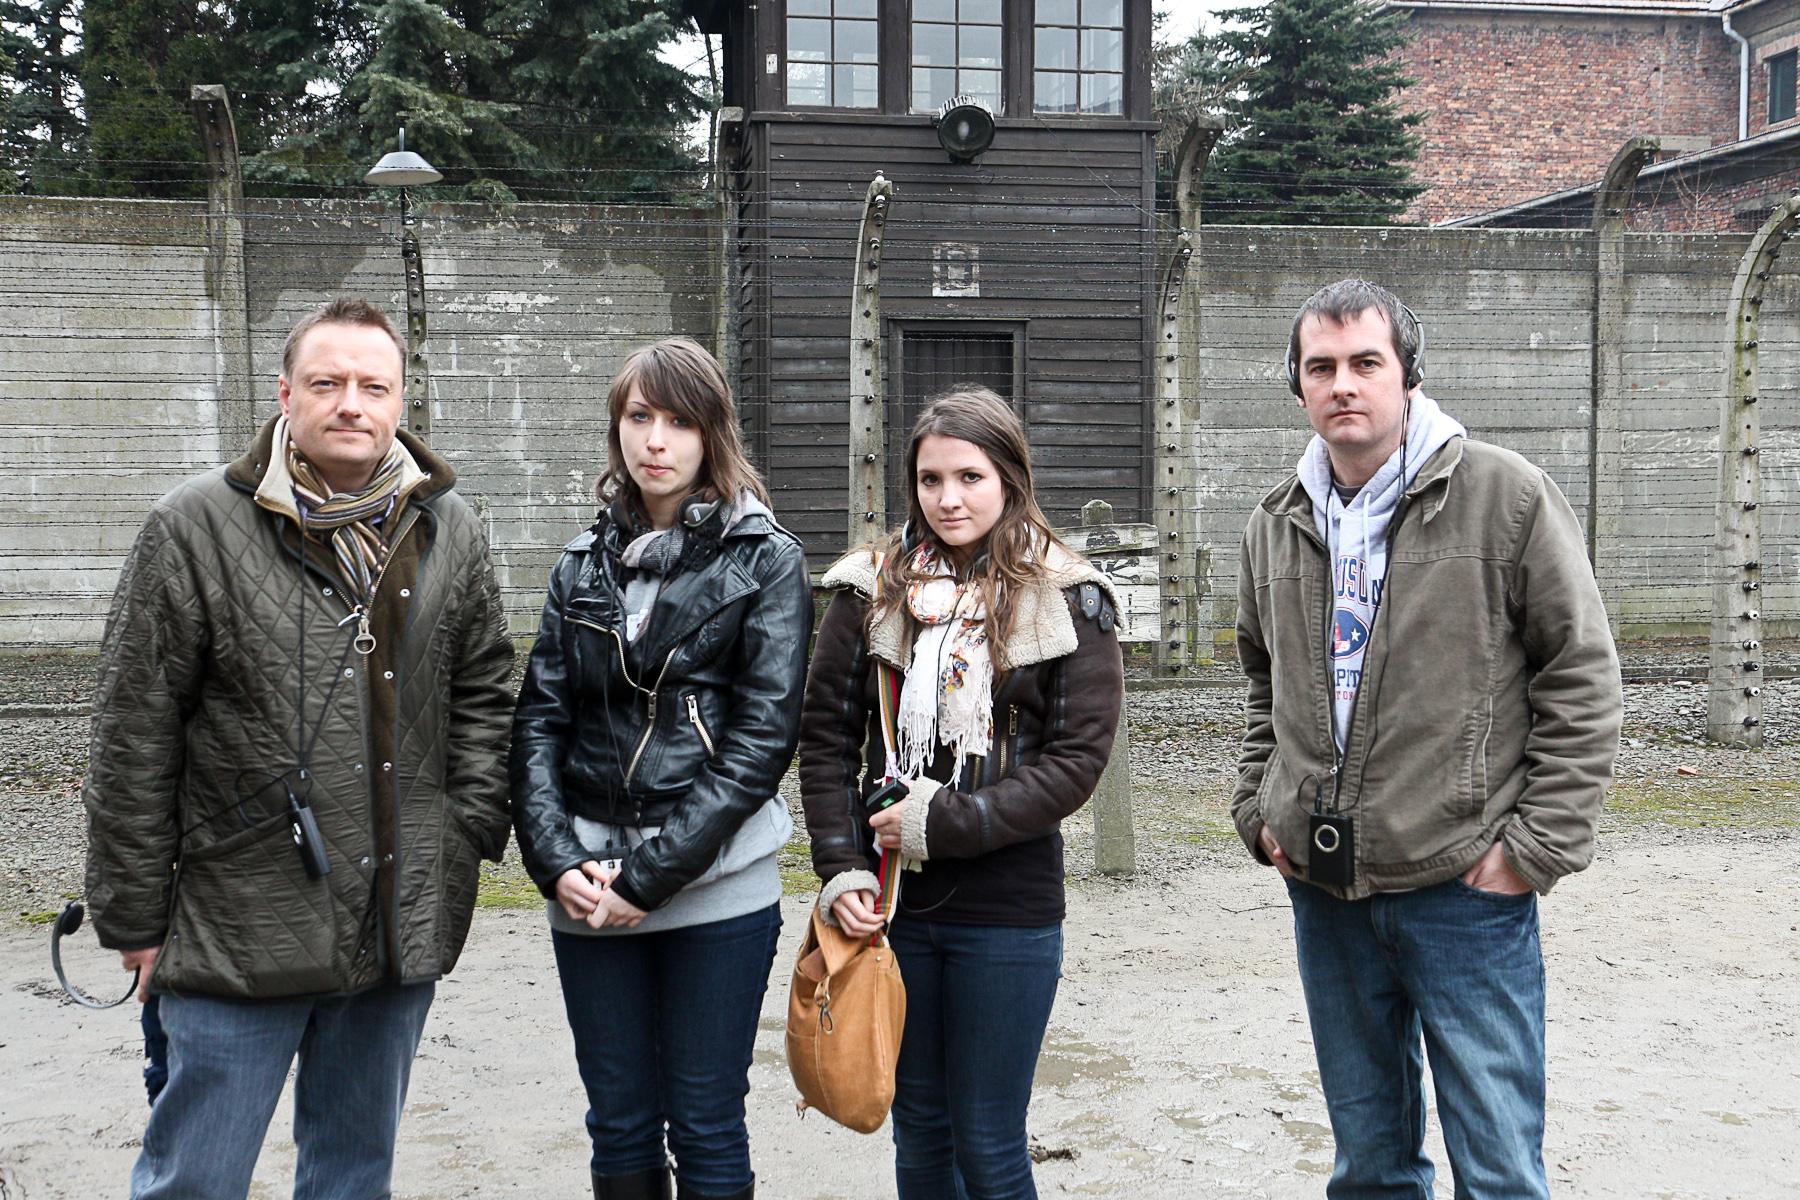 HET Trip to Auschwitz-Bikenau